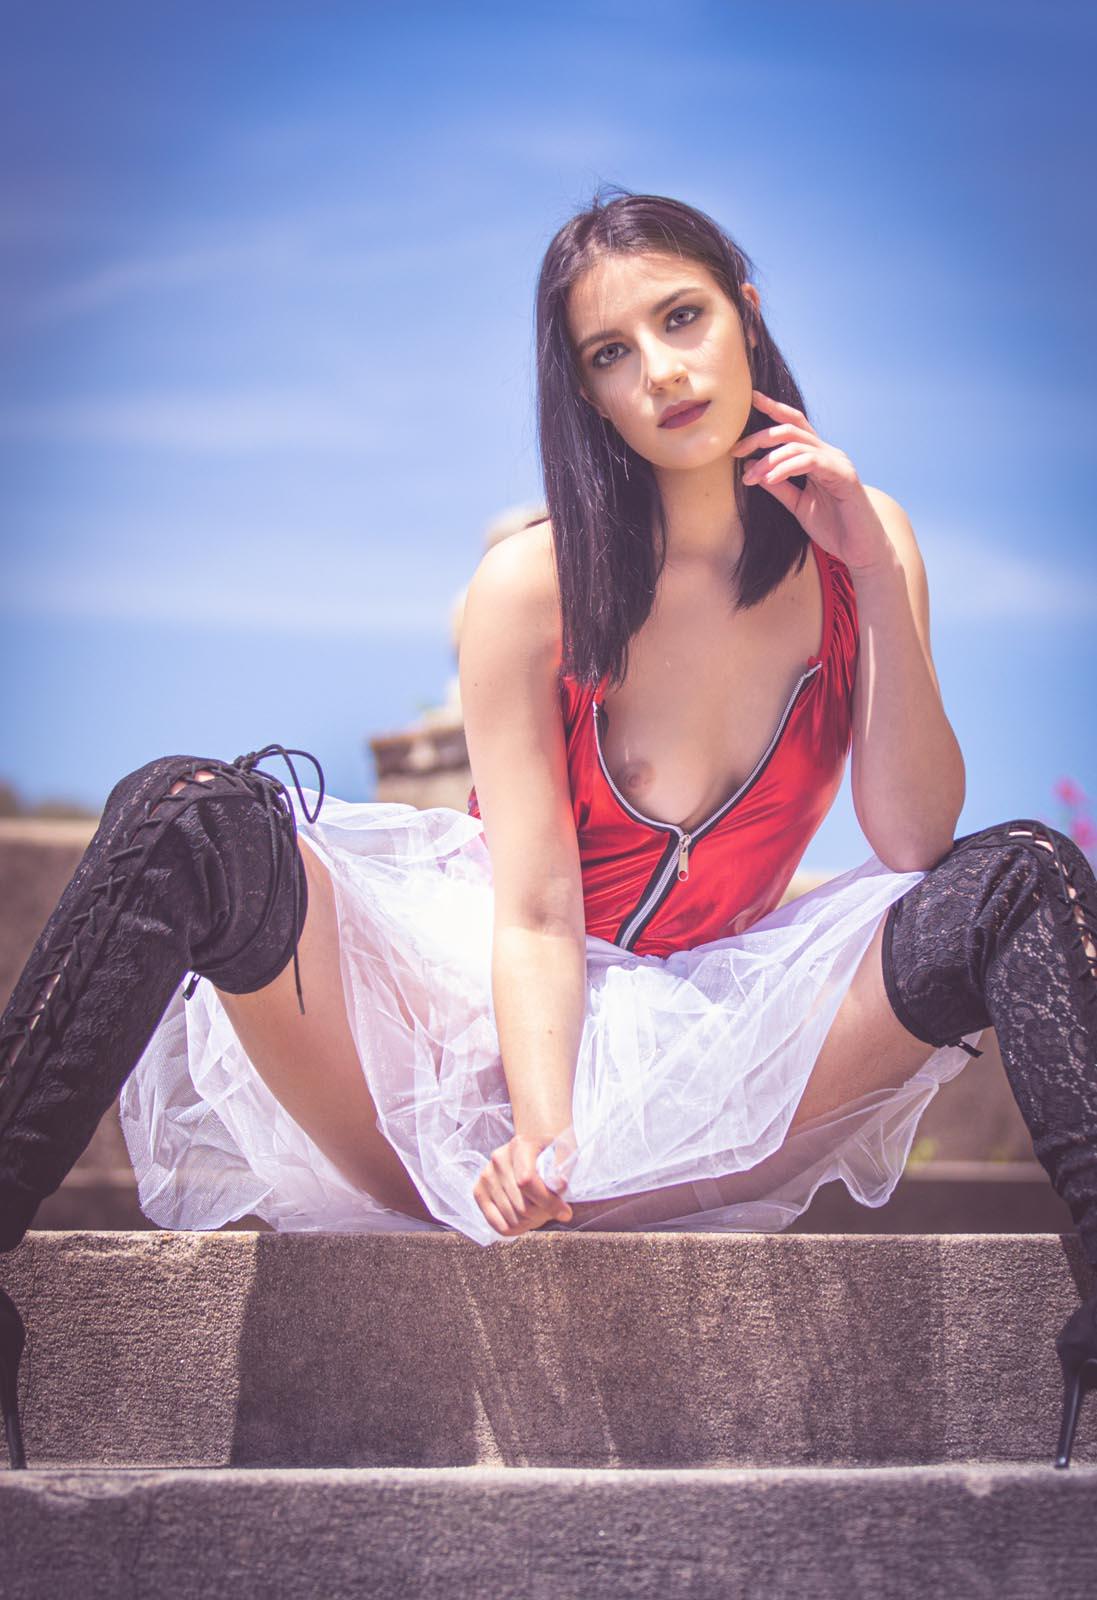 Marica_nudeart_Messina13